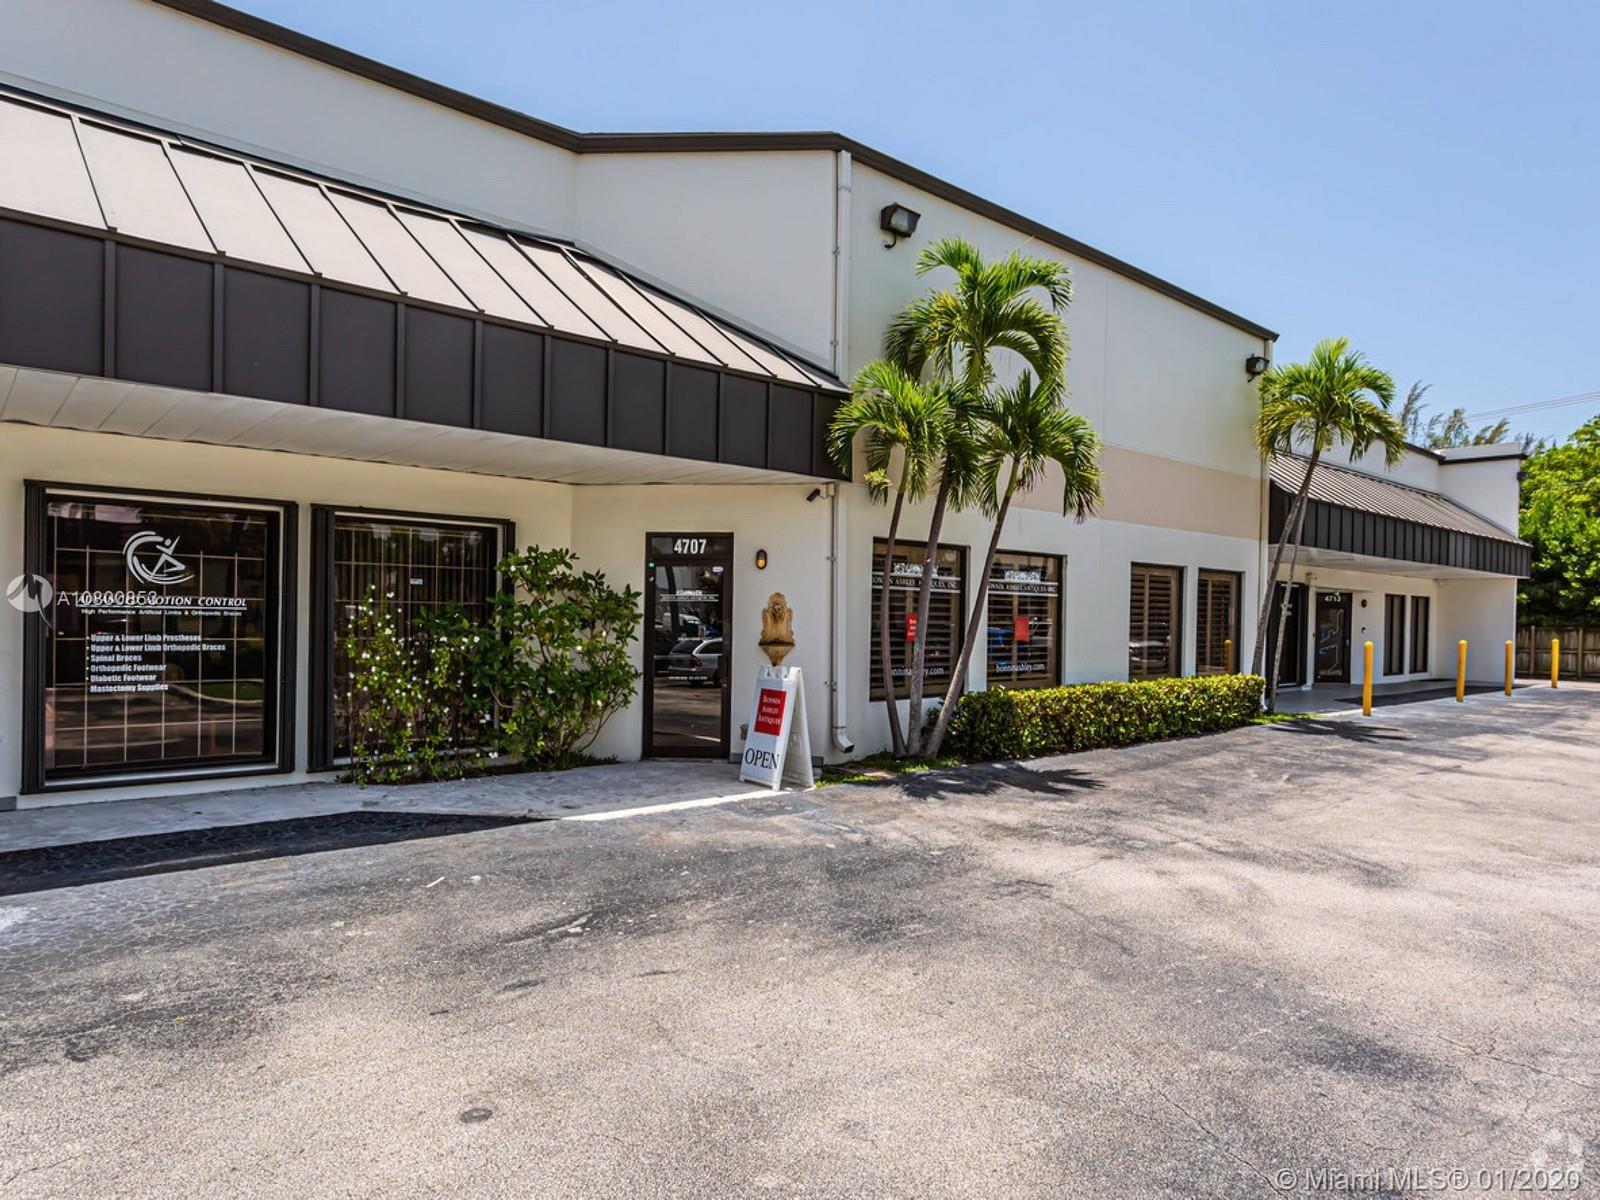 4707 SW 72nd Ave, Miami, FL 33155